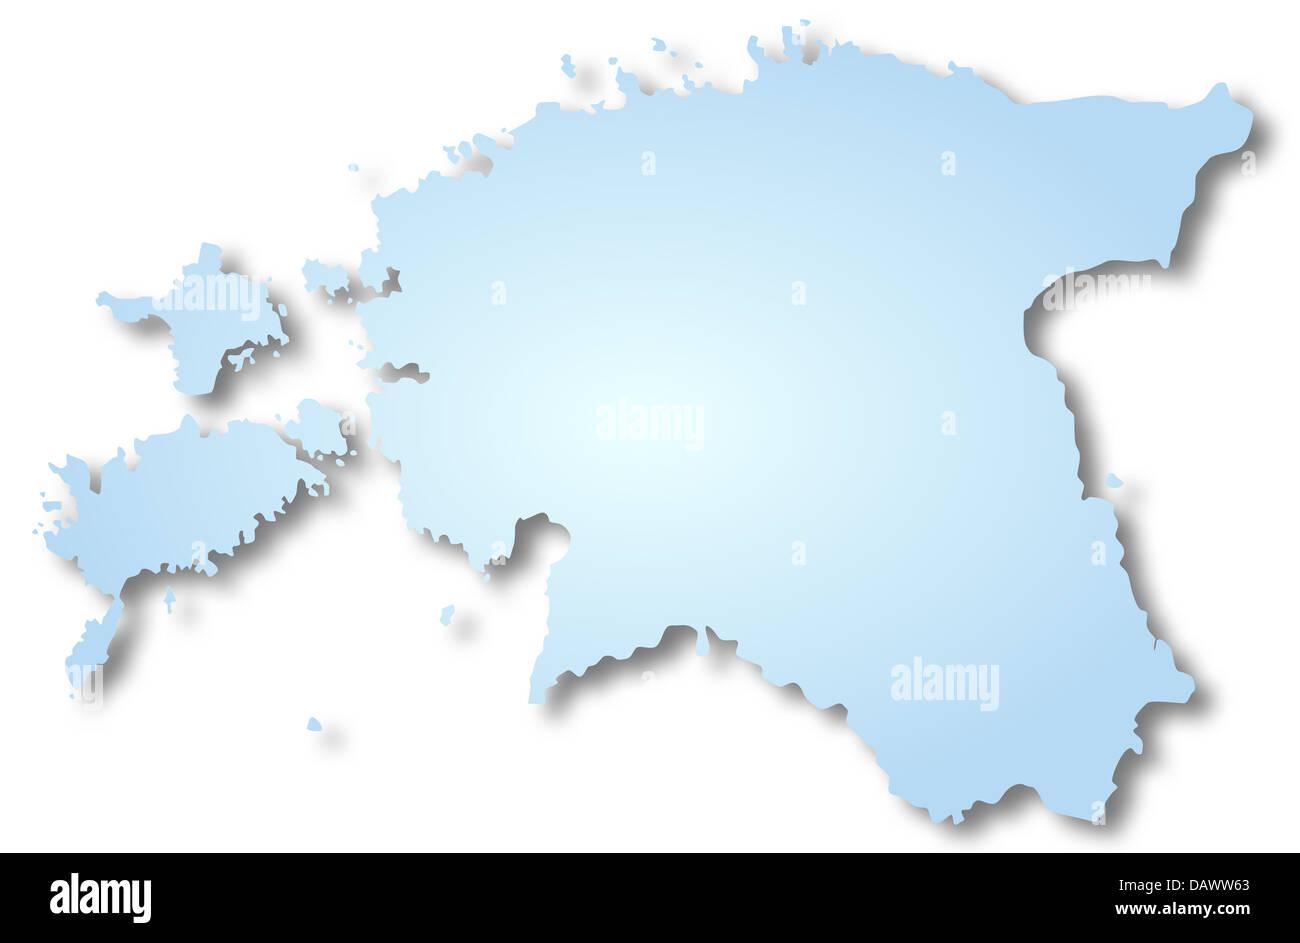 Map of Estonia - Stock Image